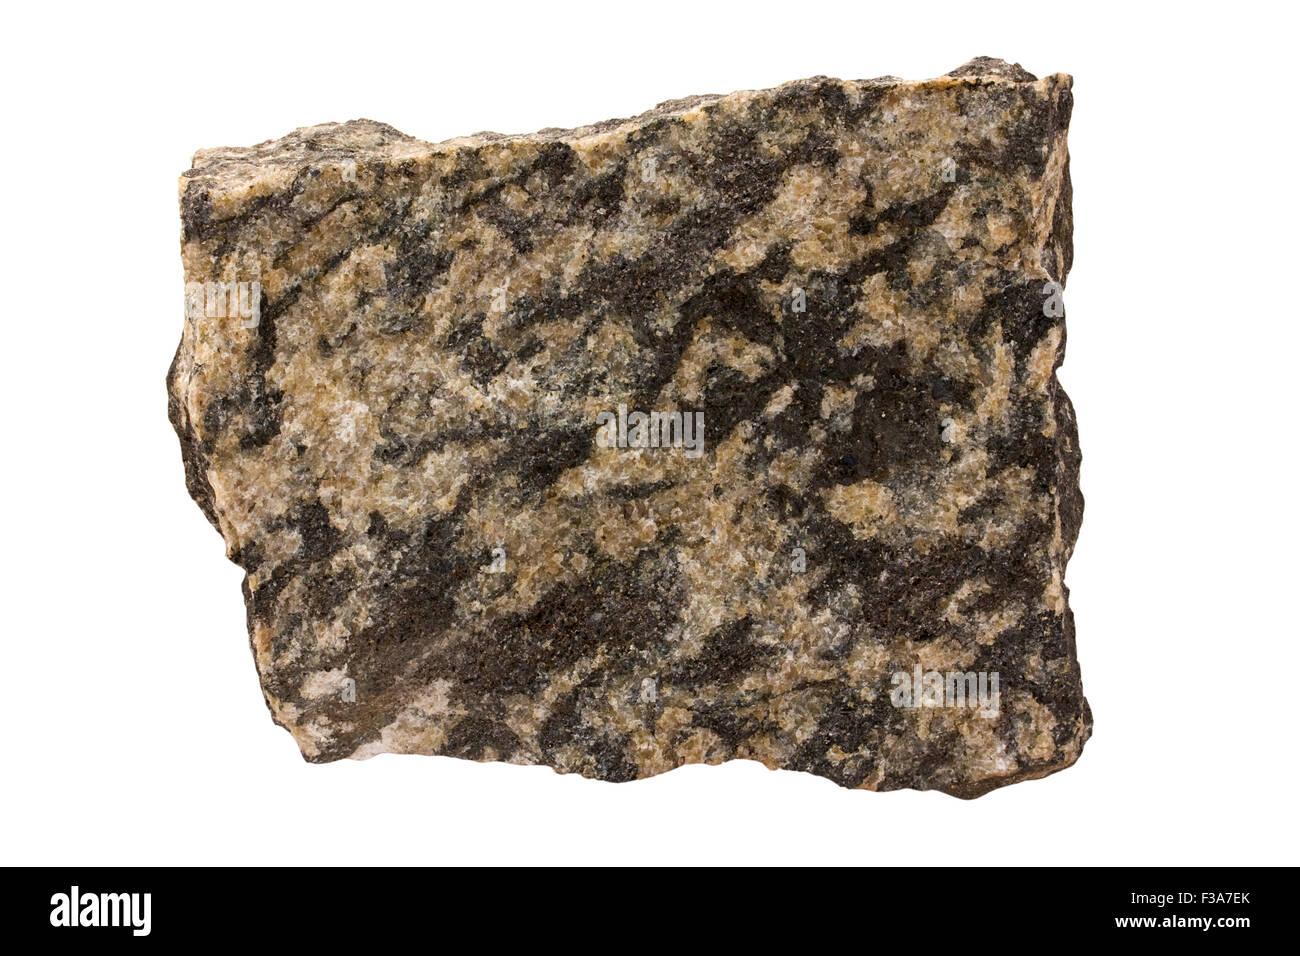 Monzonite rock sample Stock Photo, Royalty Free Image: 88121227 ...